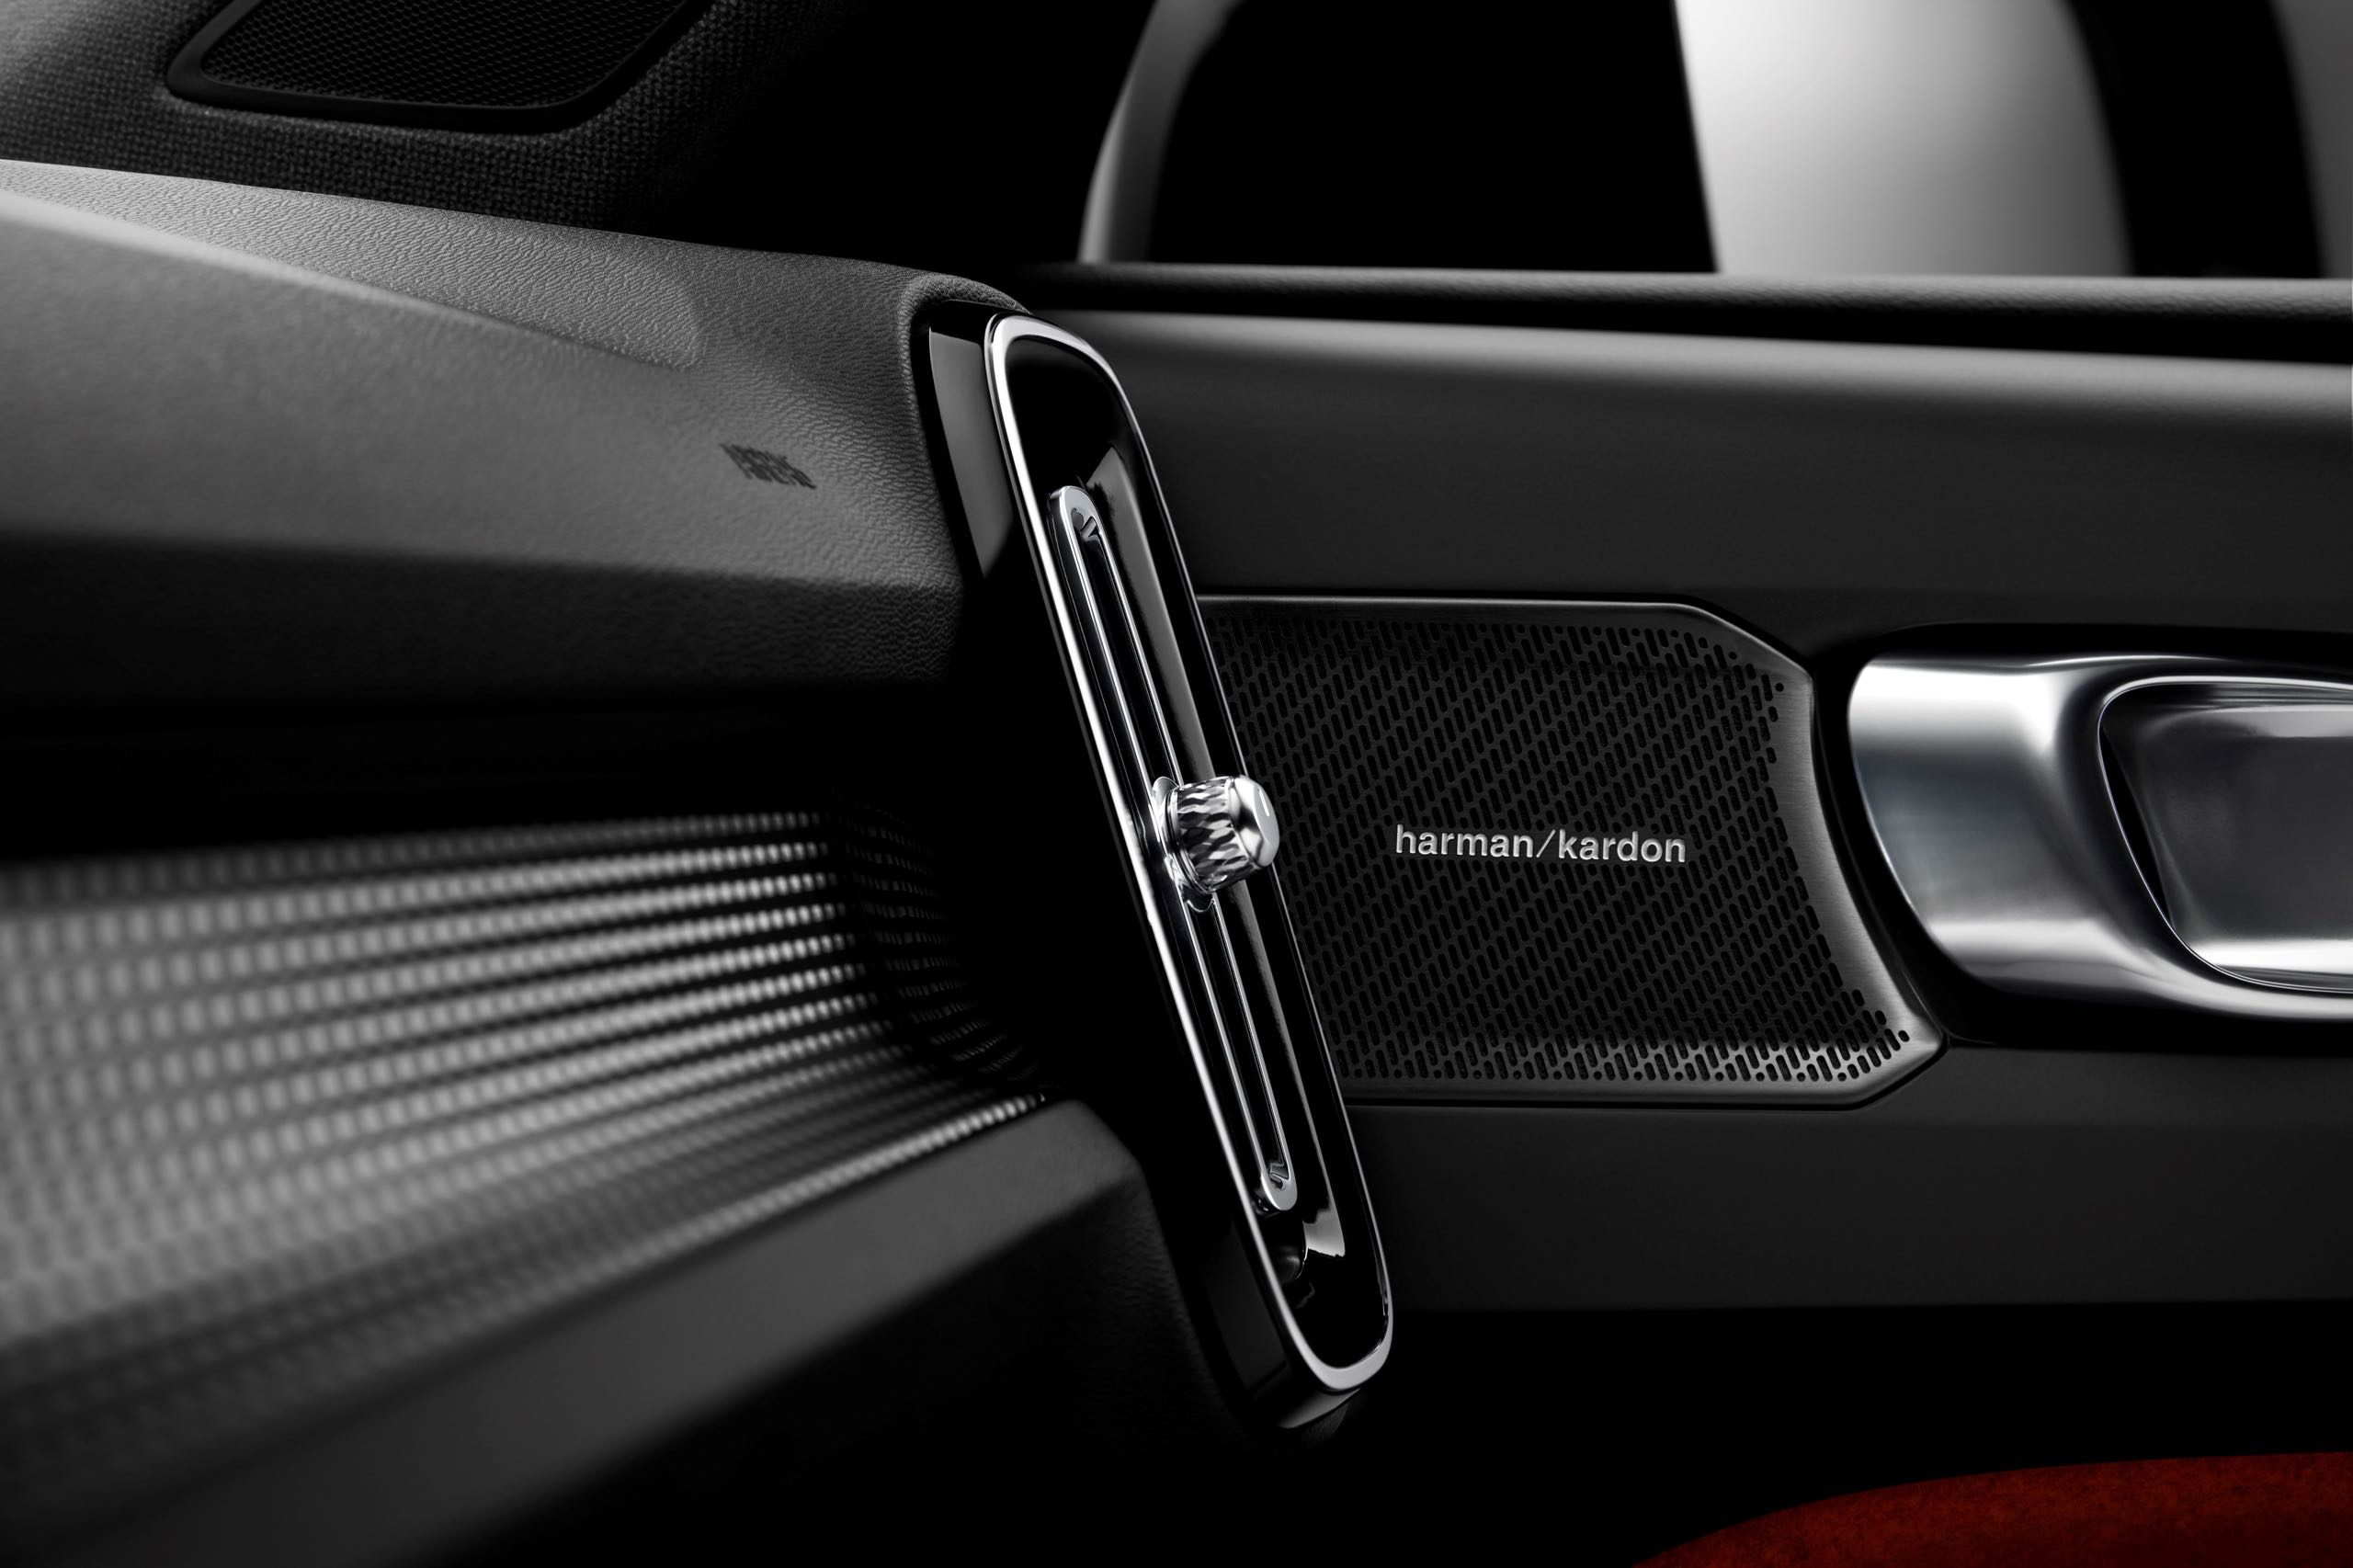 New Volvo XC40 Harman Kardon Speakers -  2017, 2018, 2018 New XC40, Detail, Images, Interior, New XC40, Technology